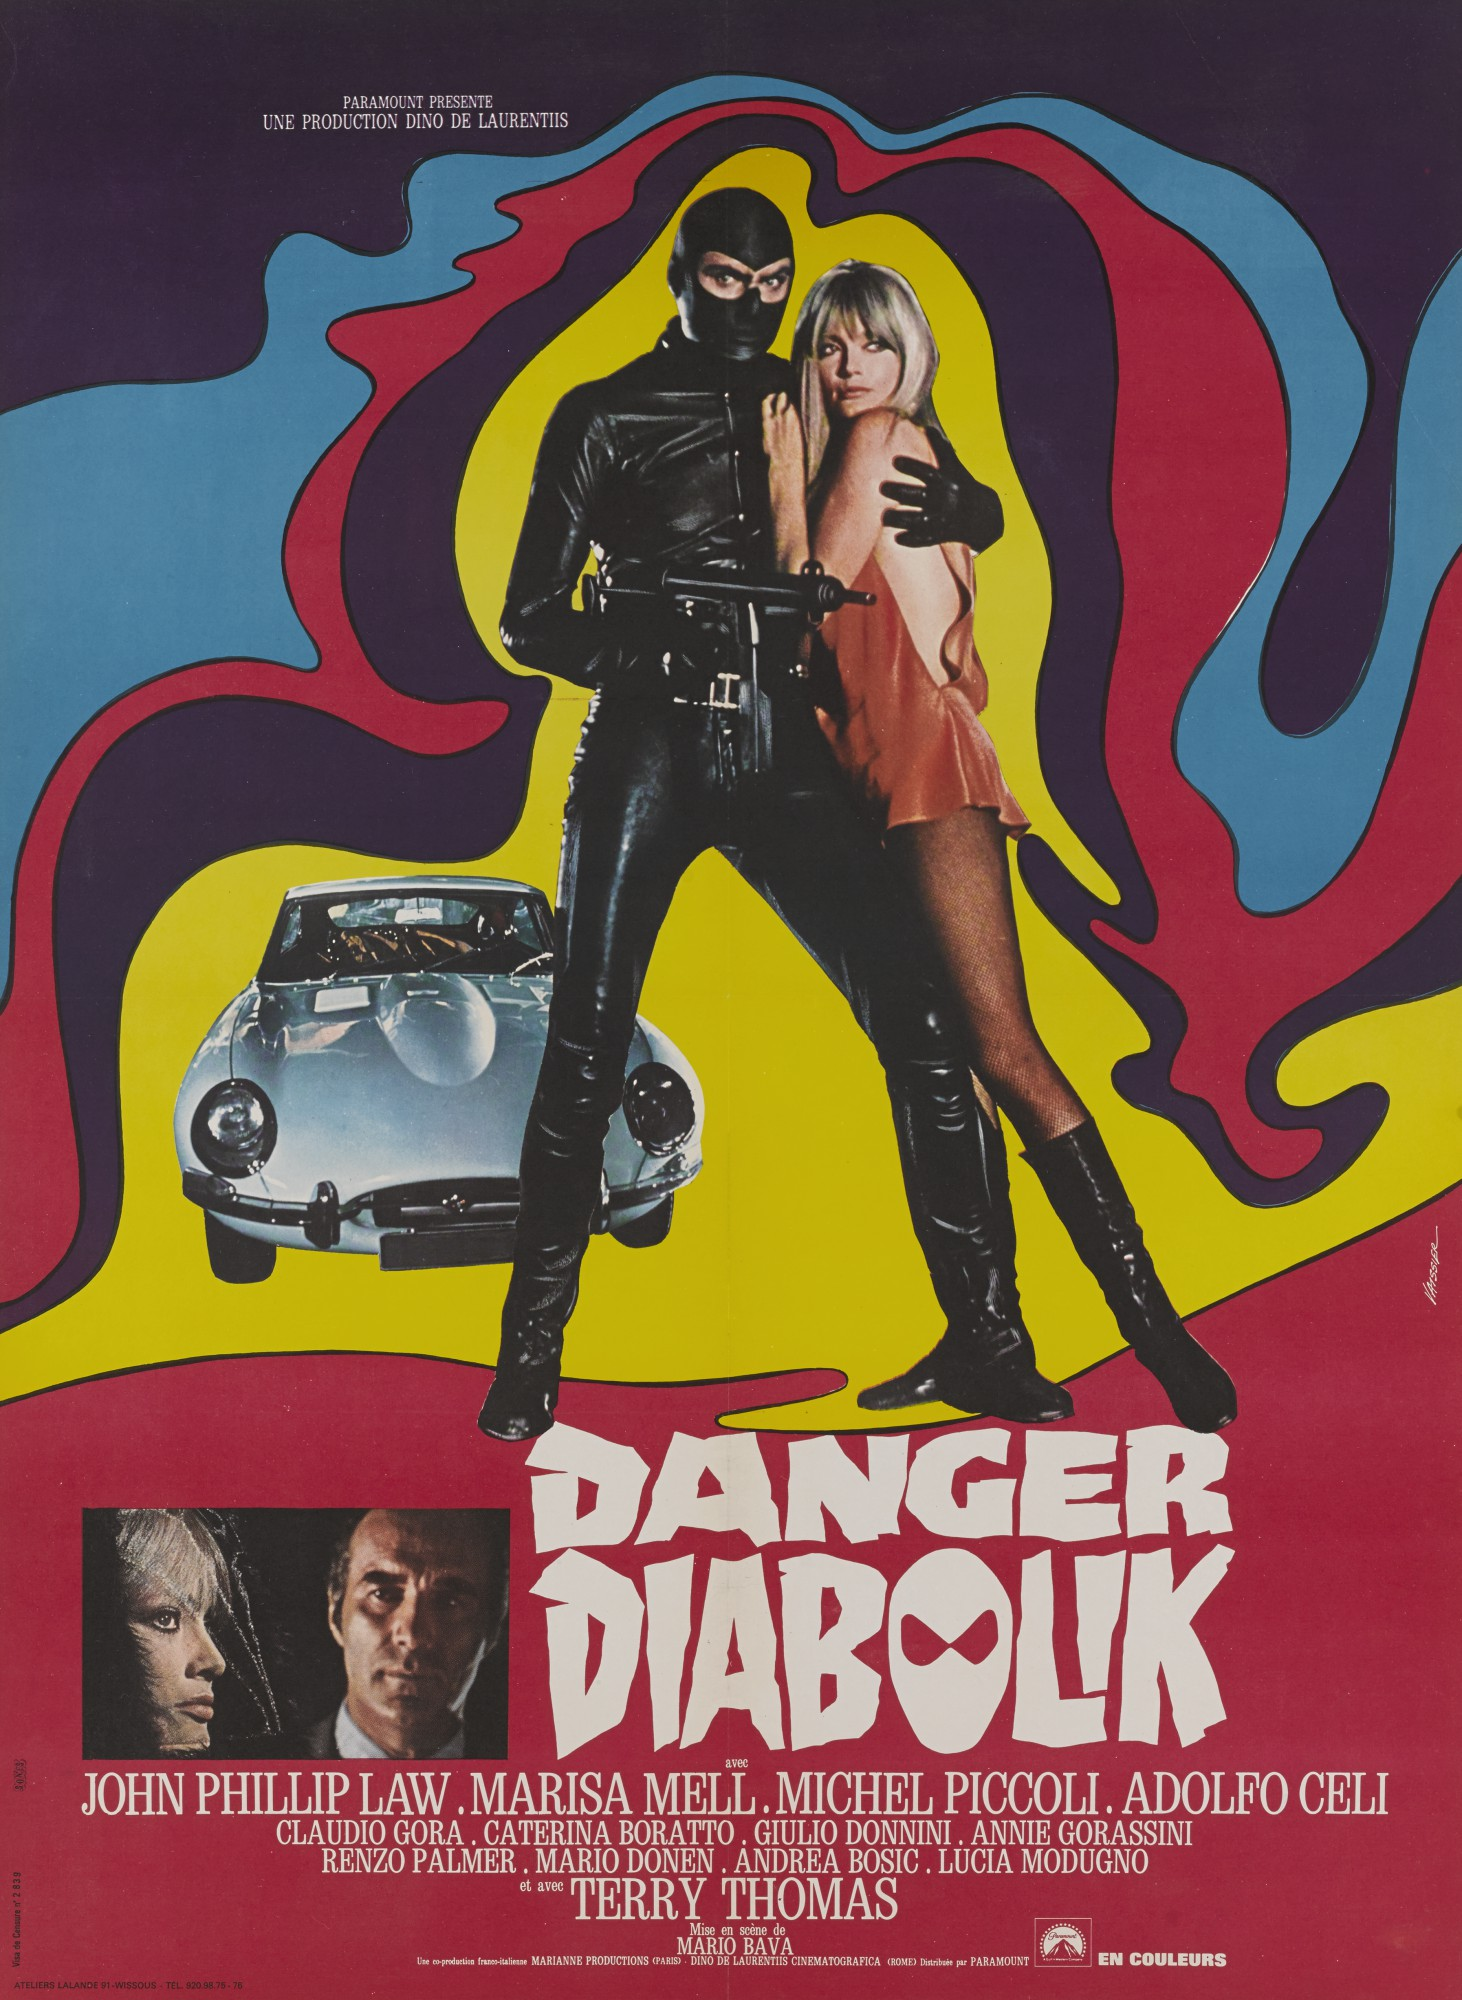 DIABOLIK/DANGER: DIABOLIK (1967) POSTER, FRENCH